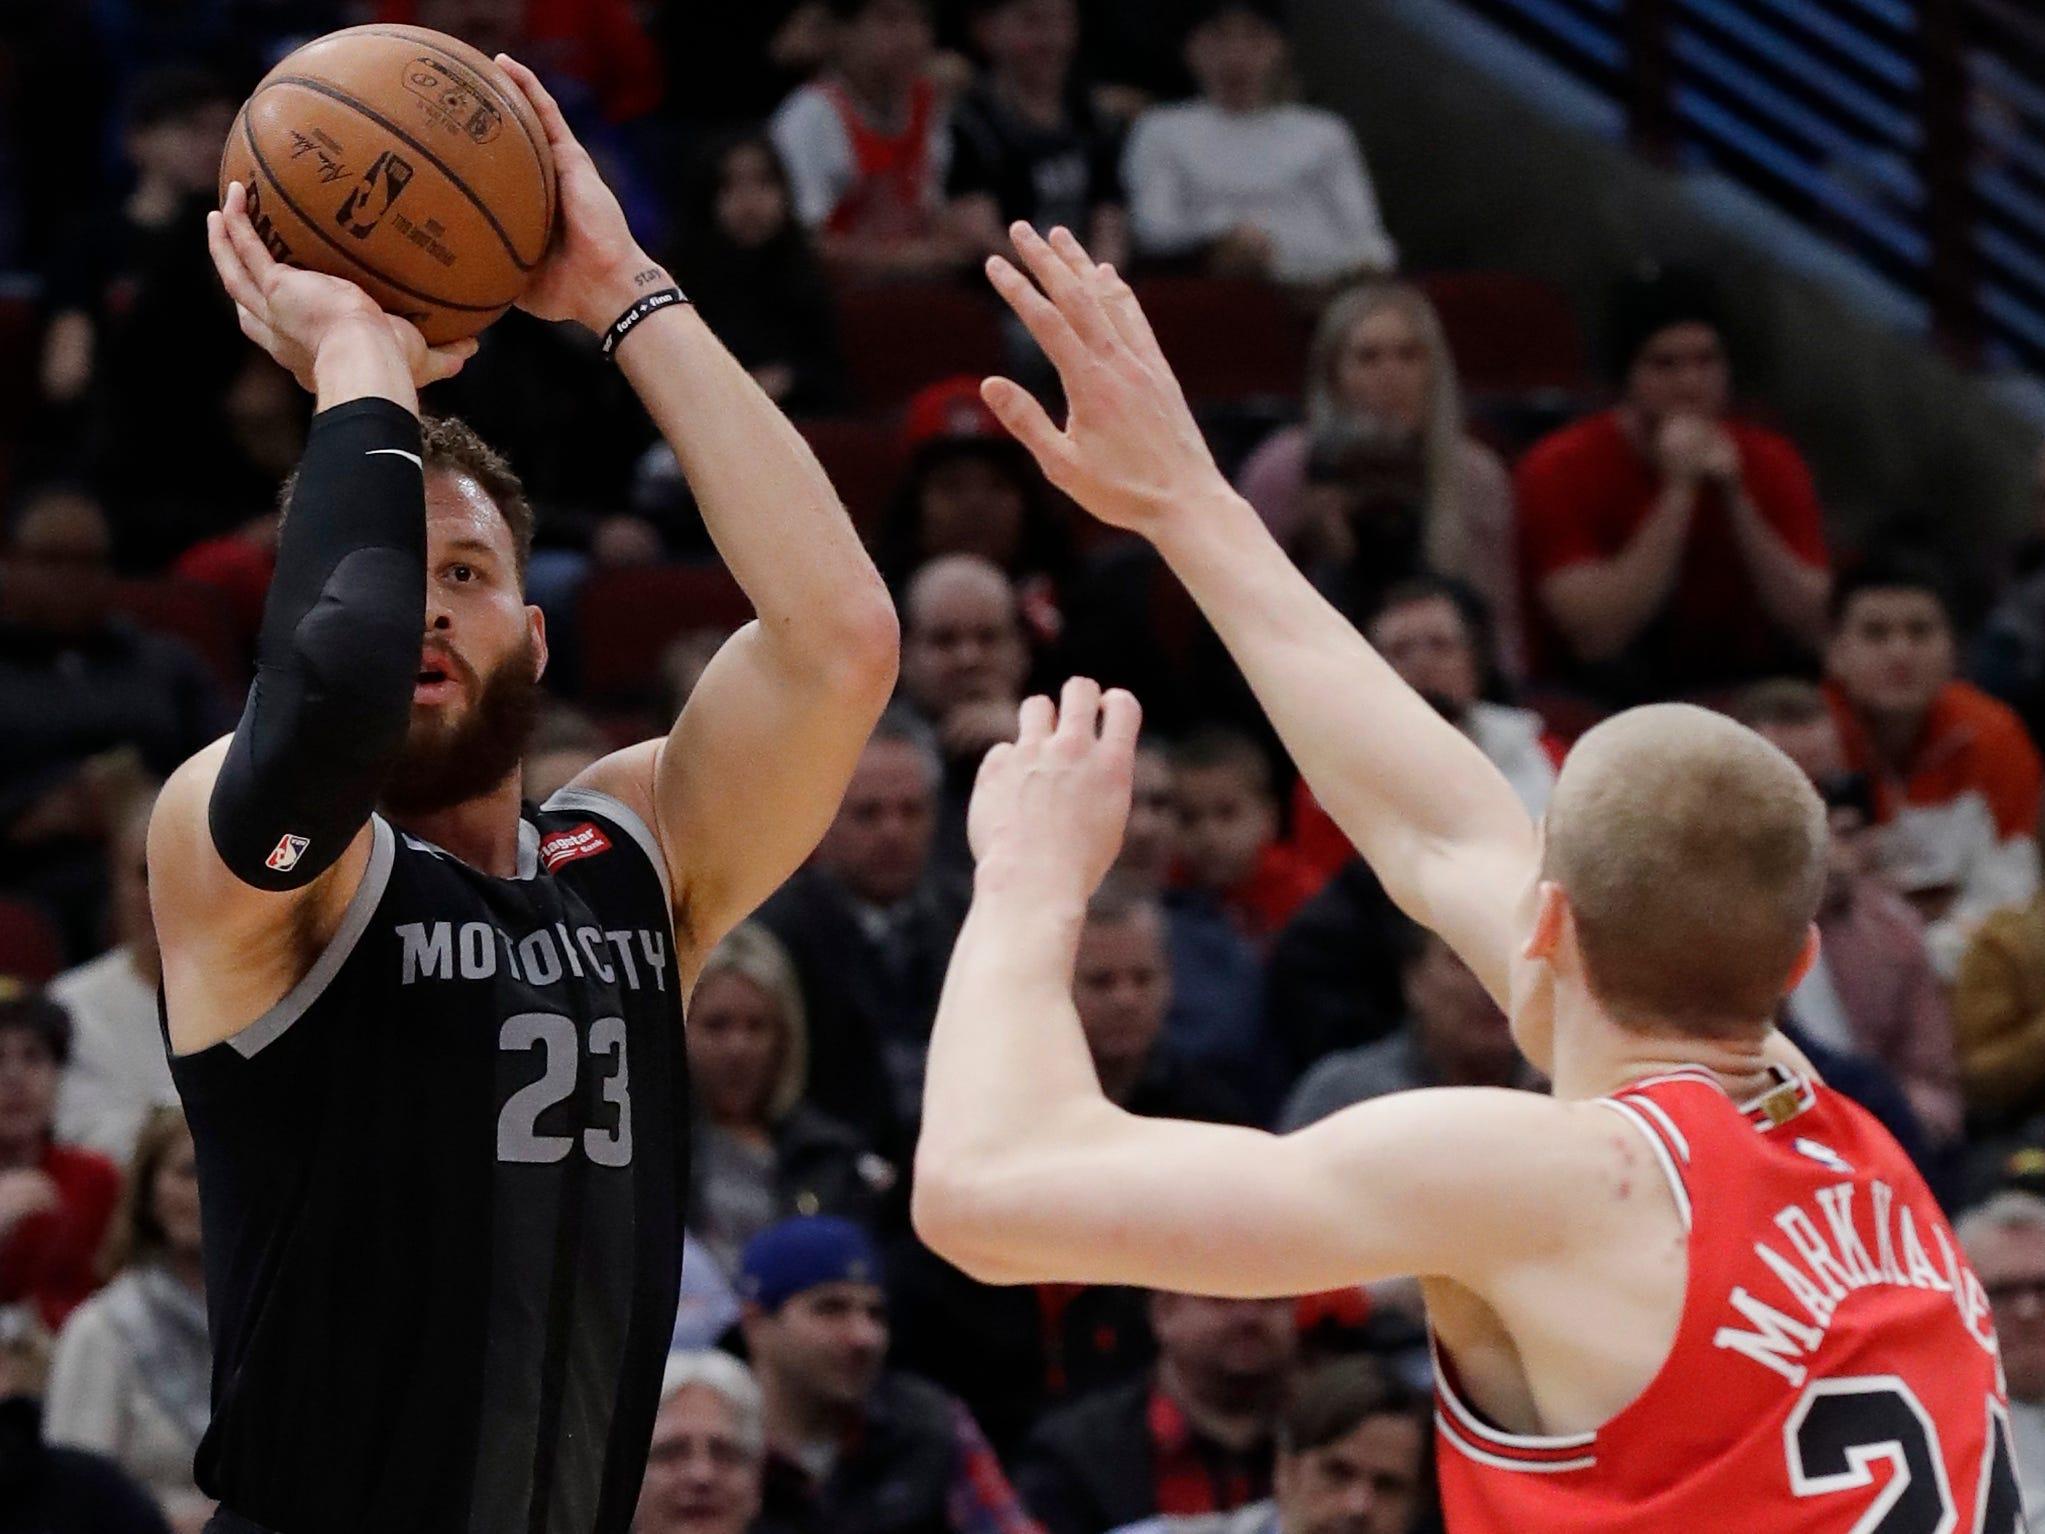 Detroit Pistons forward Blake Griffin, left, shoots against Chicago Bulls forward Lauri Markkanen during the first half.